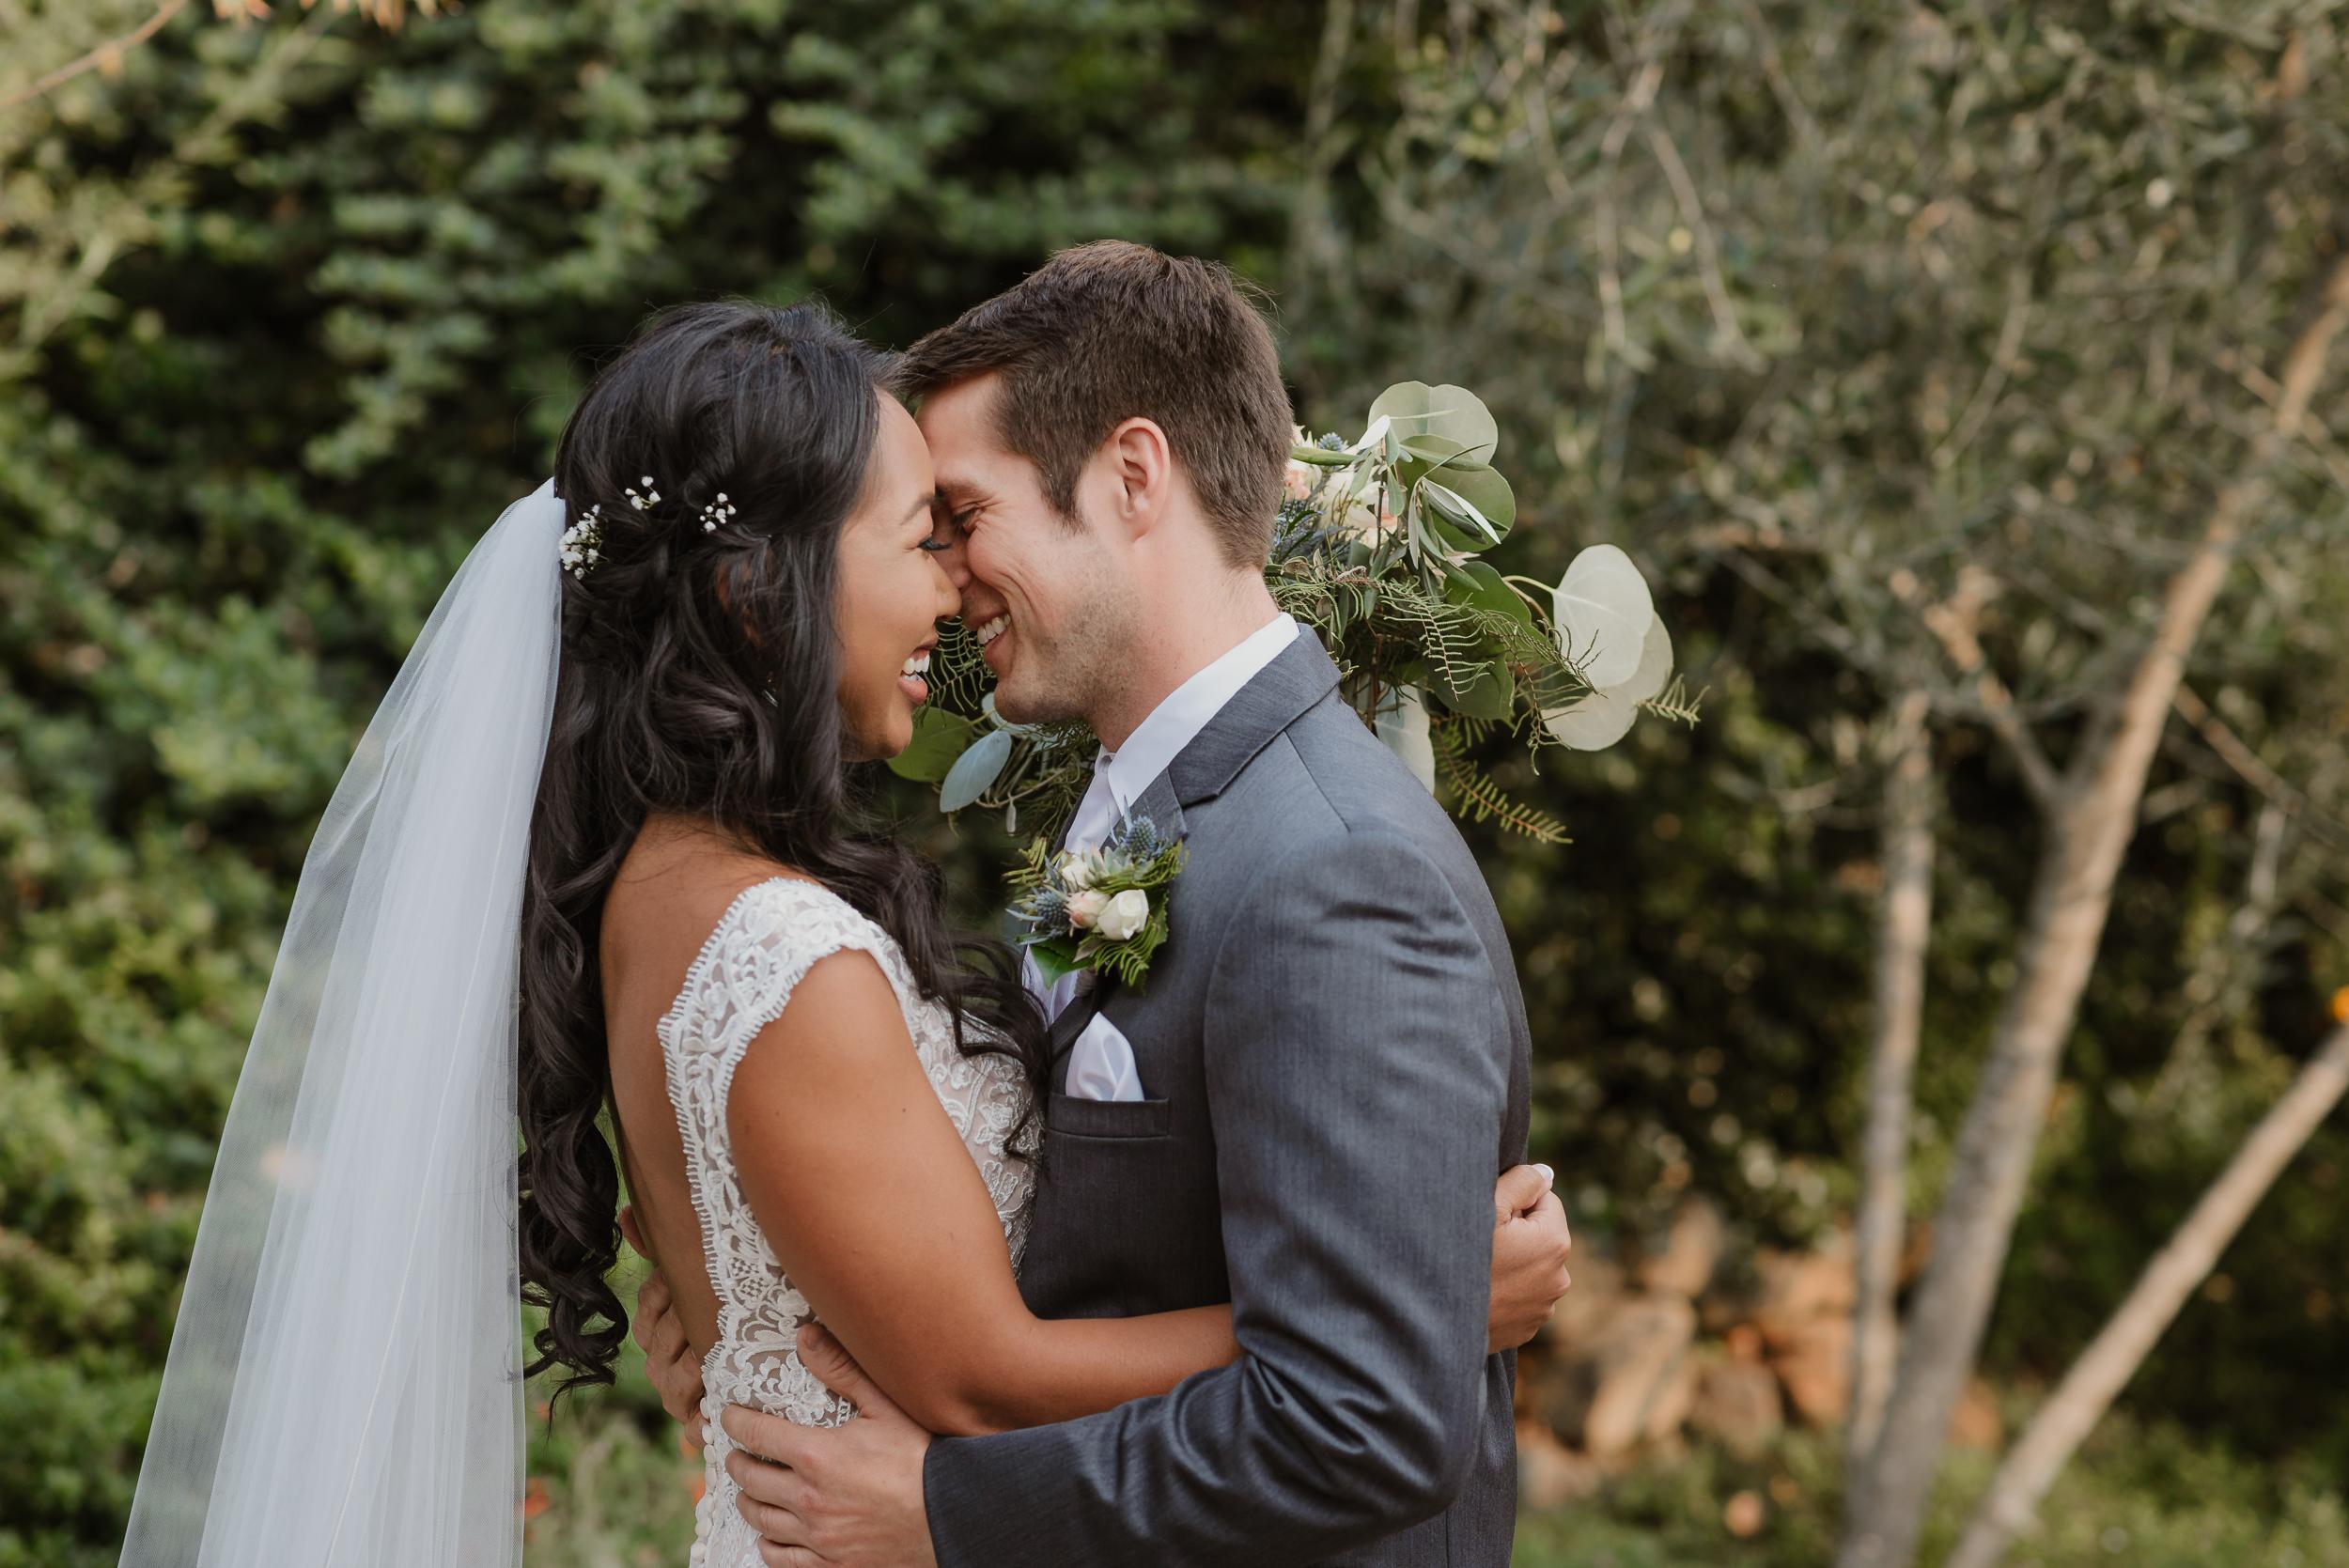 027marin-petaluma-backyard-wedding-vivianchen-167.jpg